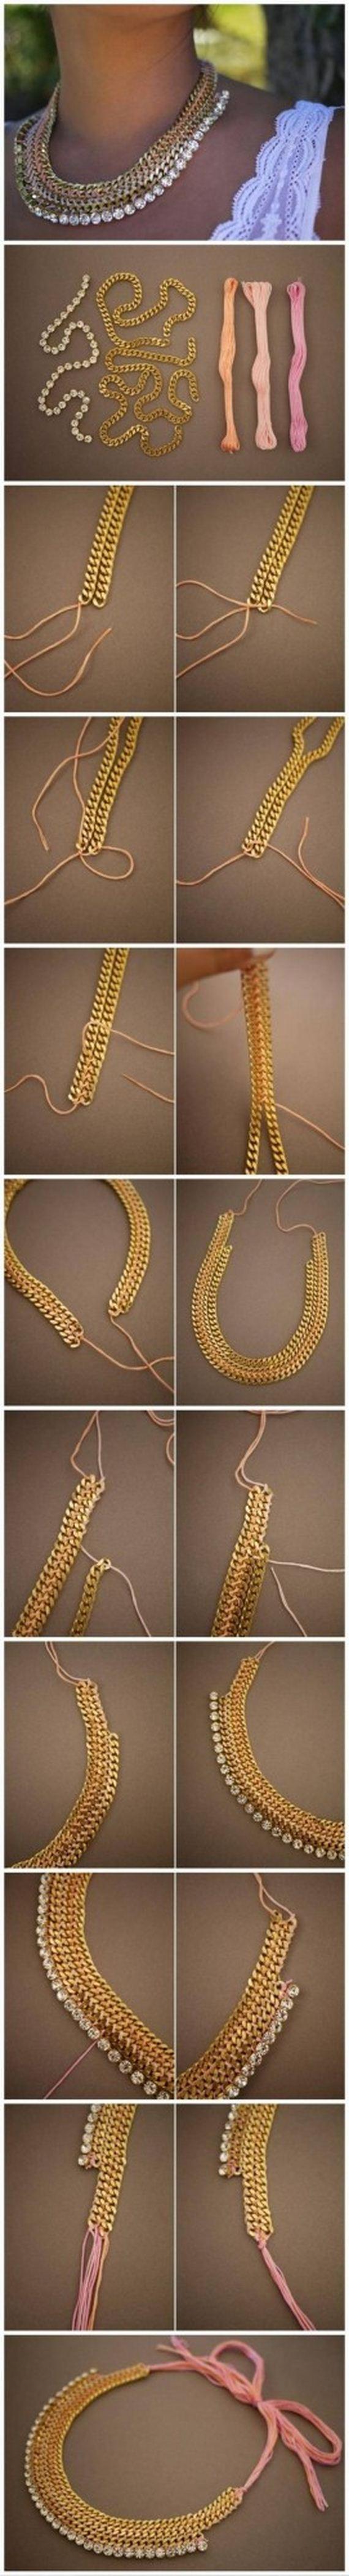 17-diy-statement-necklace-jewelry-tutorial-ideas